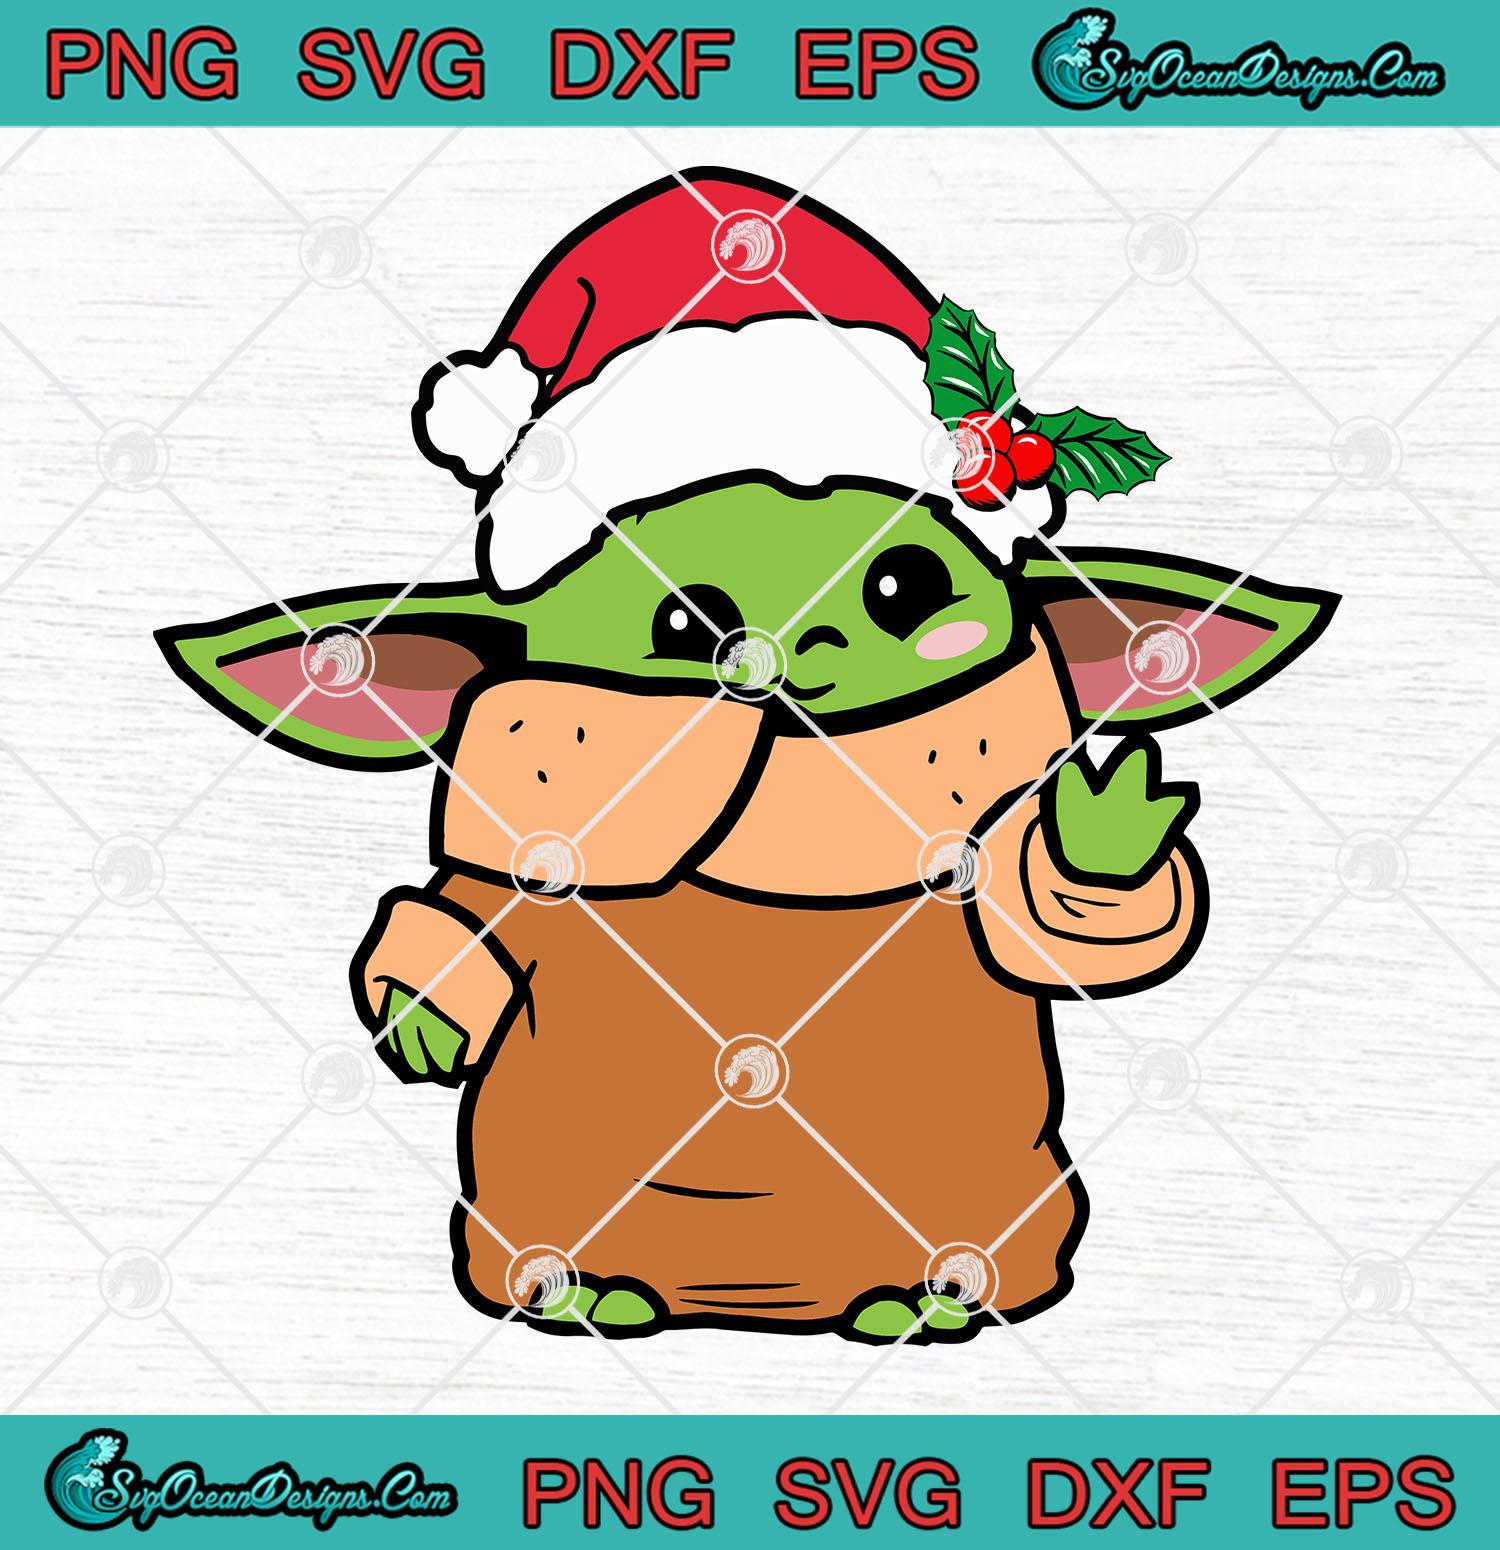 Baby Yoda Christmas Star Wars The Mandalorian Svg Png Eps Dxf The Child Christmas The Mandalorian Svg Png Designs Digital Download